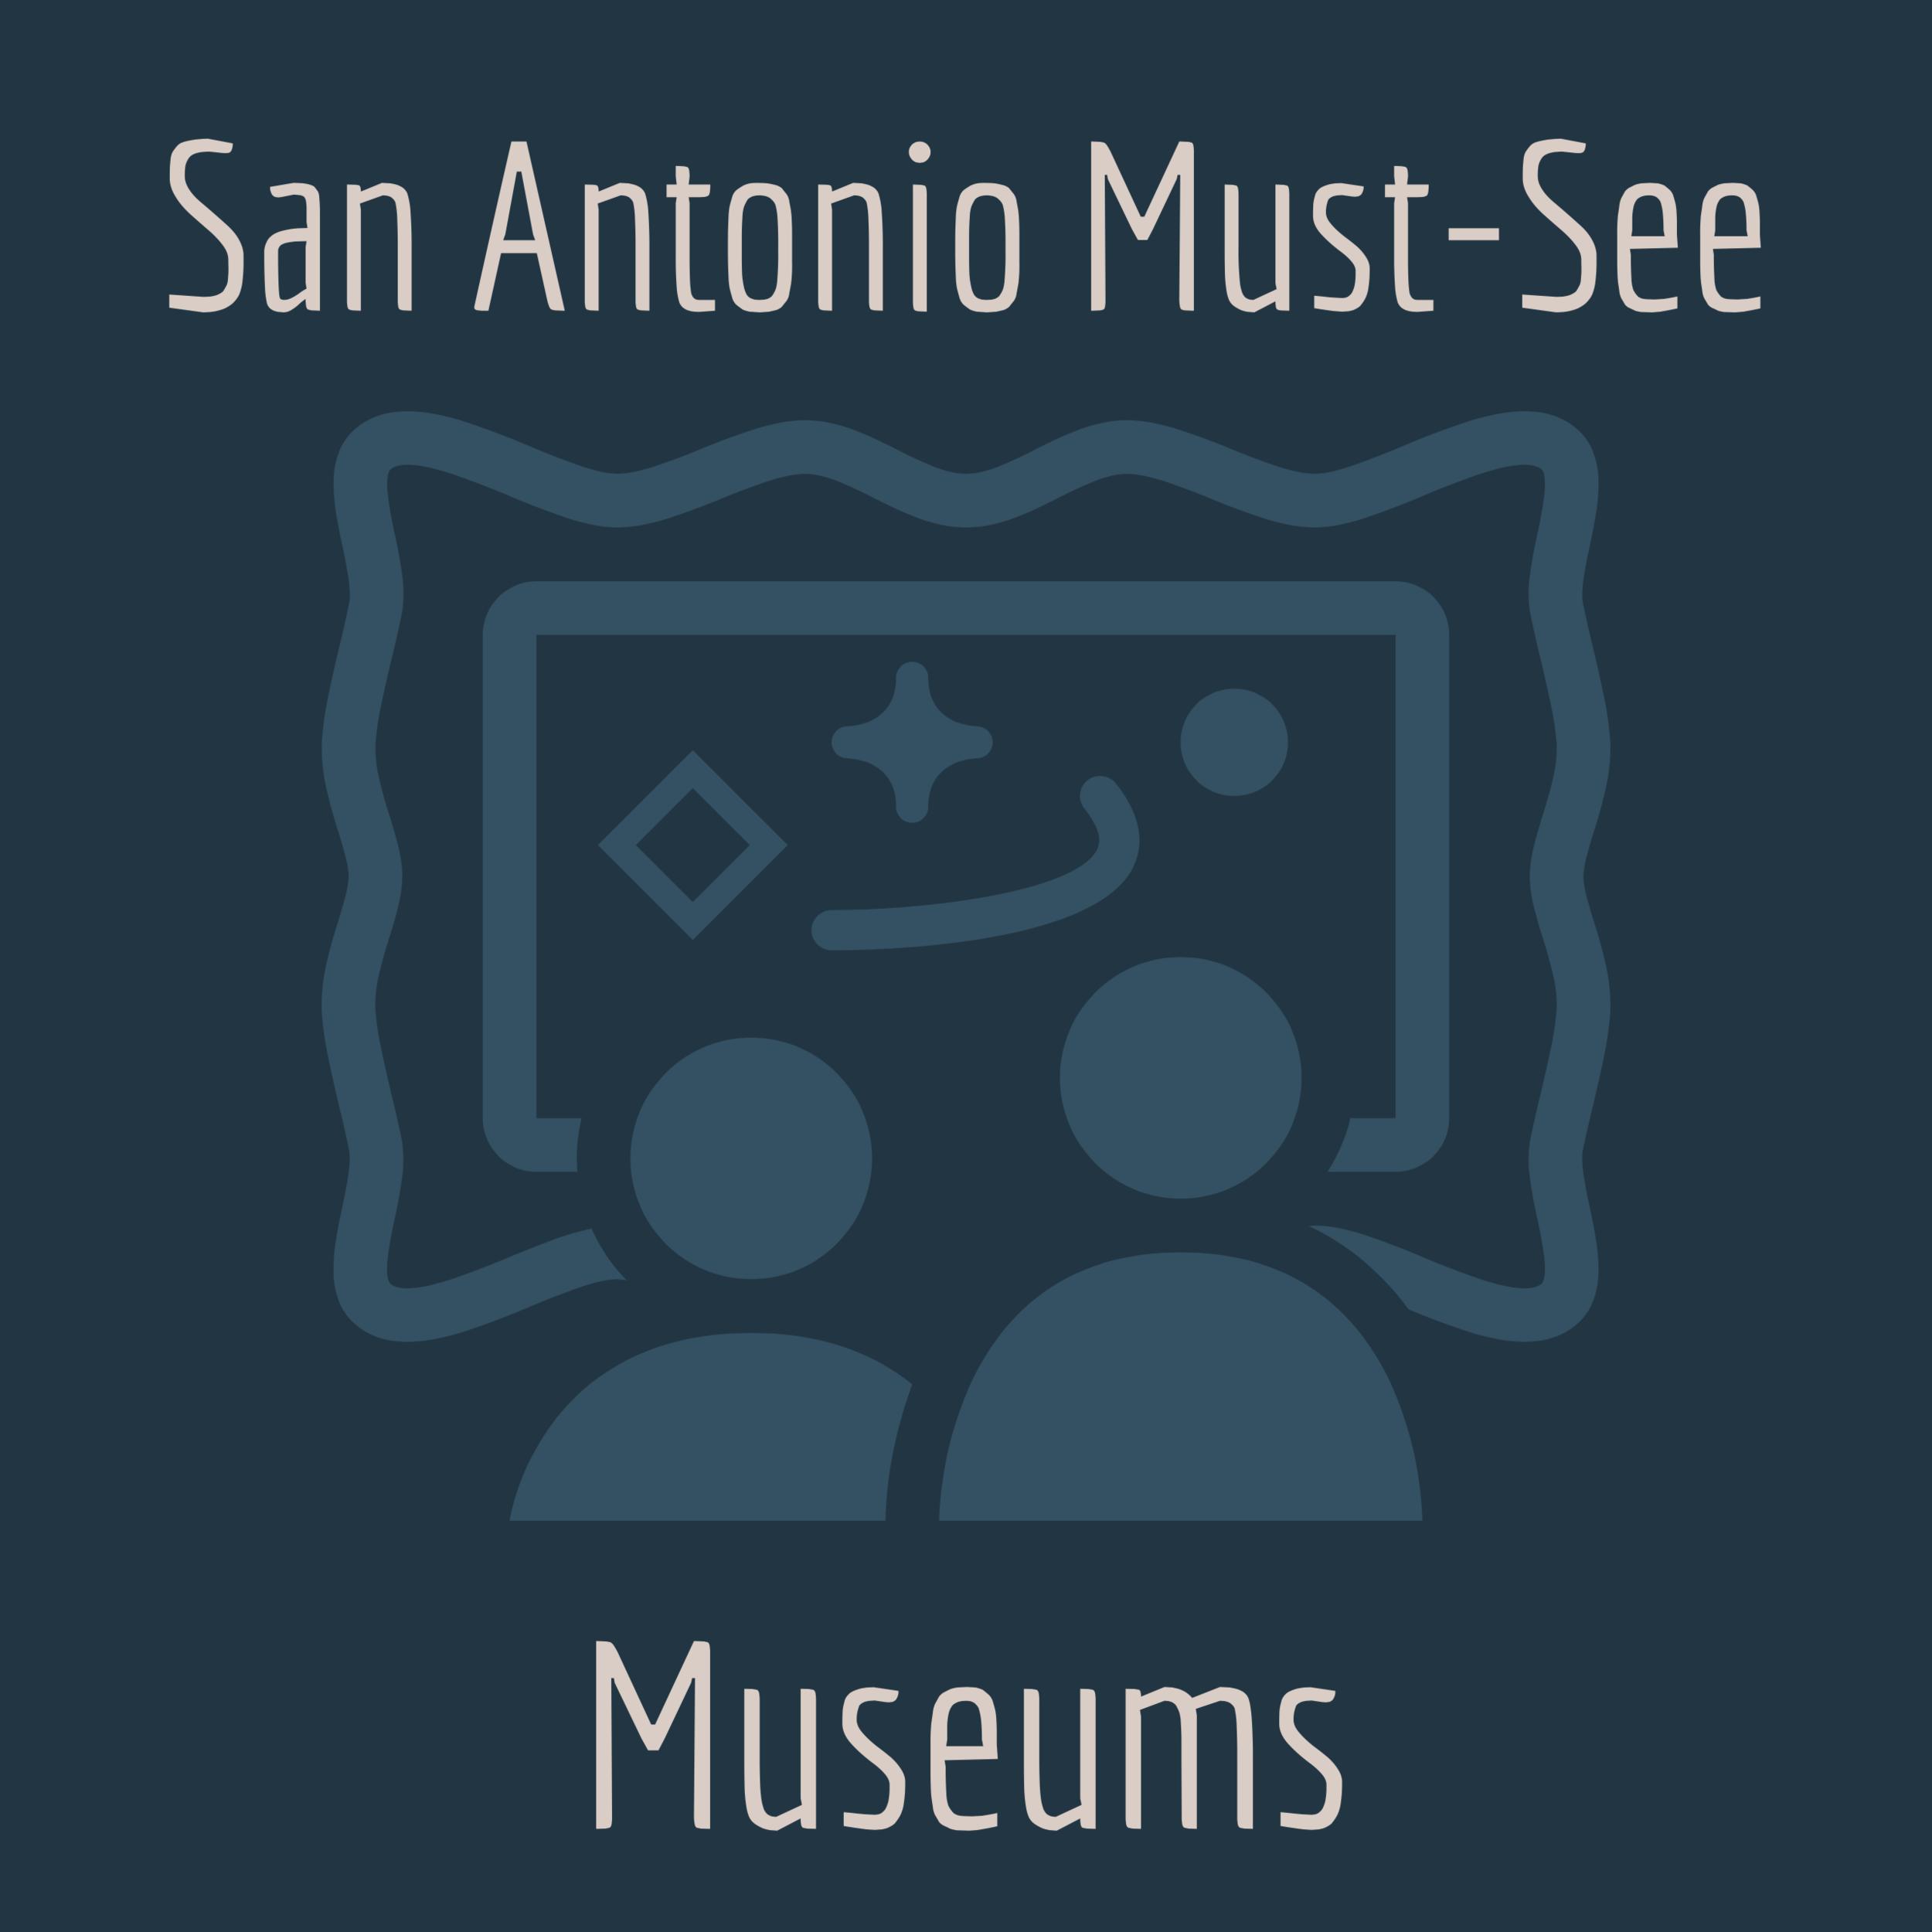 San Antonio Must see Museums.png